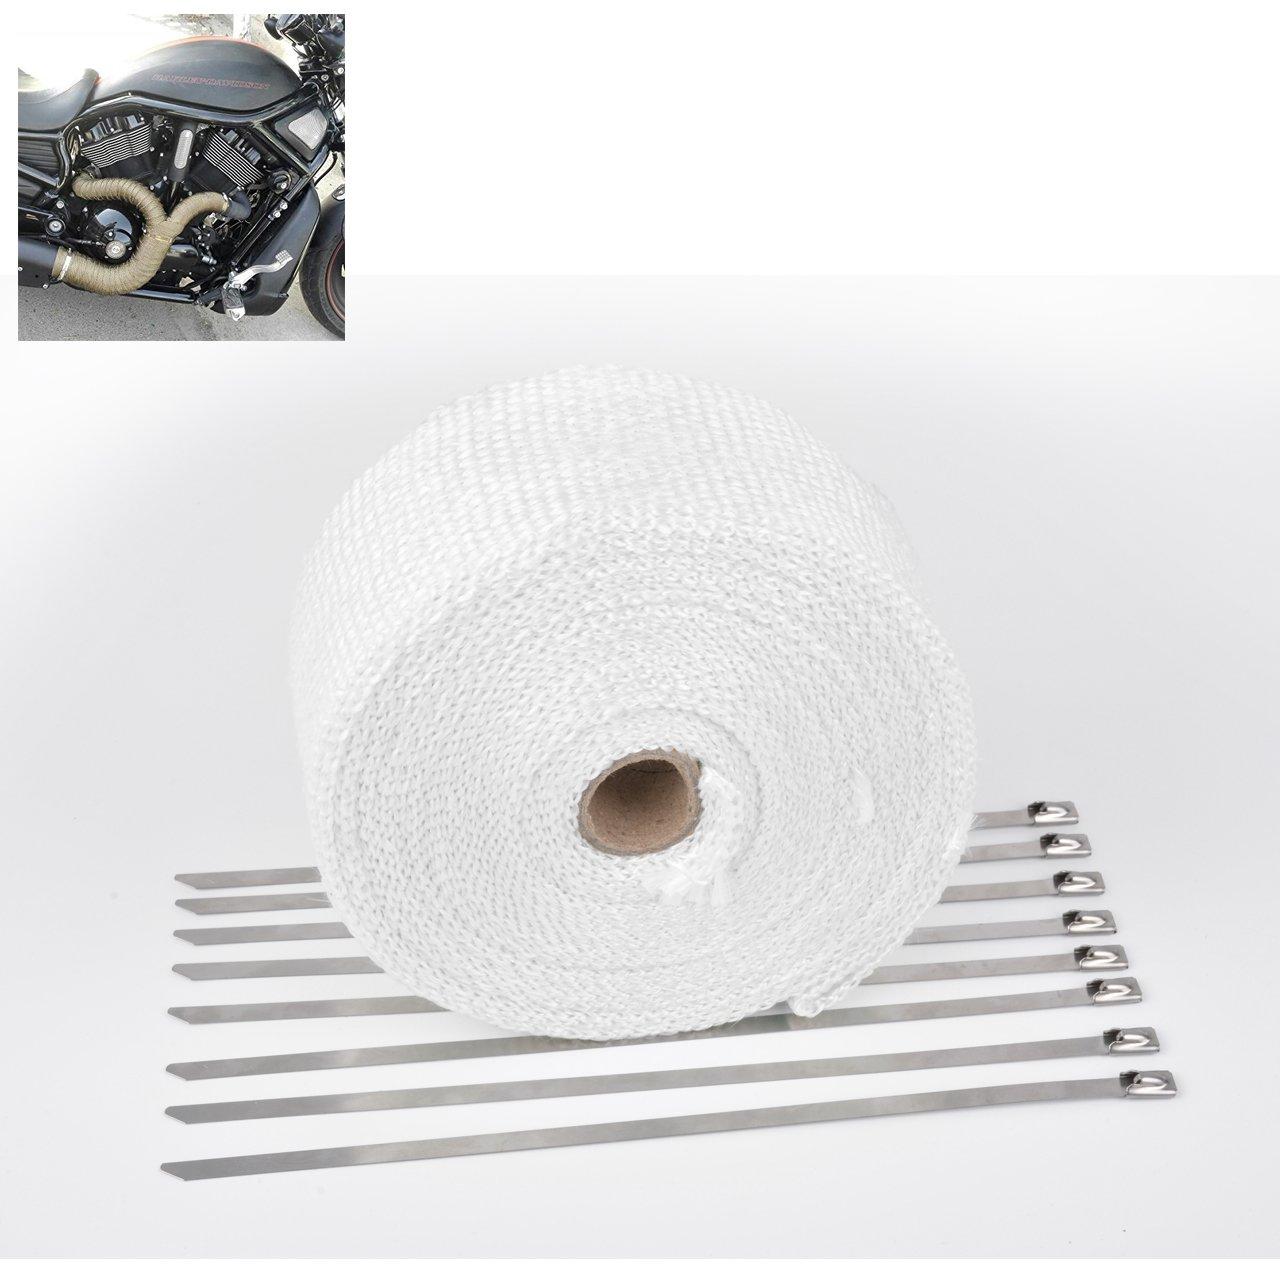 8PCS 11.8 inch Stainless Locking Ties NATGIC 15M Car Motorcycle Exhaust Heat Wrap Tap Header Glassfiber Wrap Kit 2 x50Ft Blue